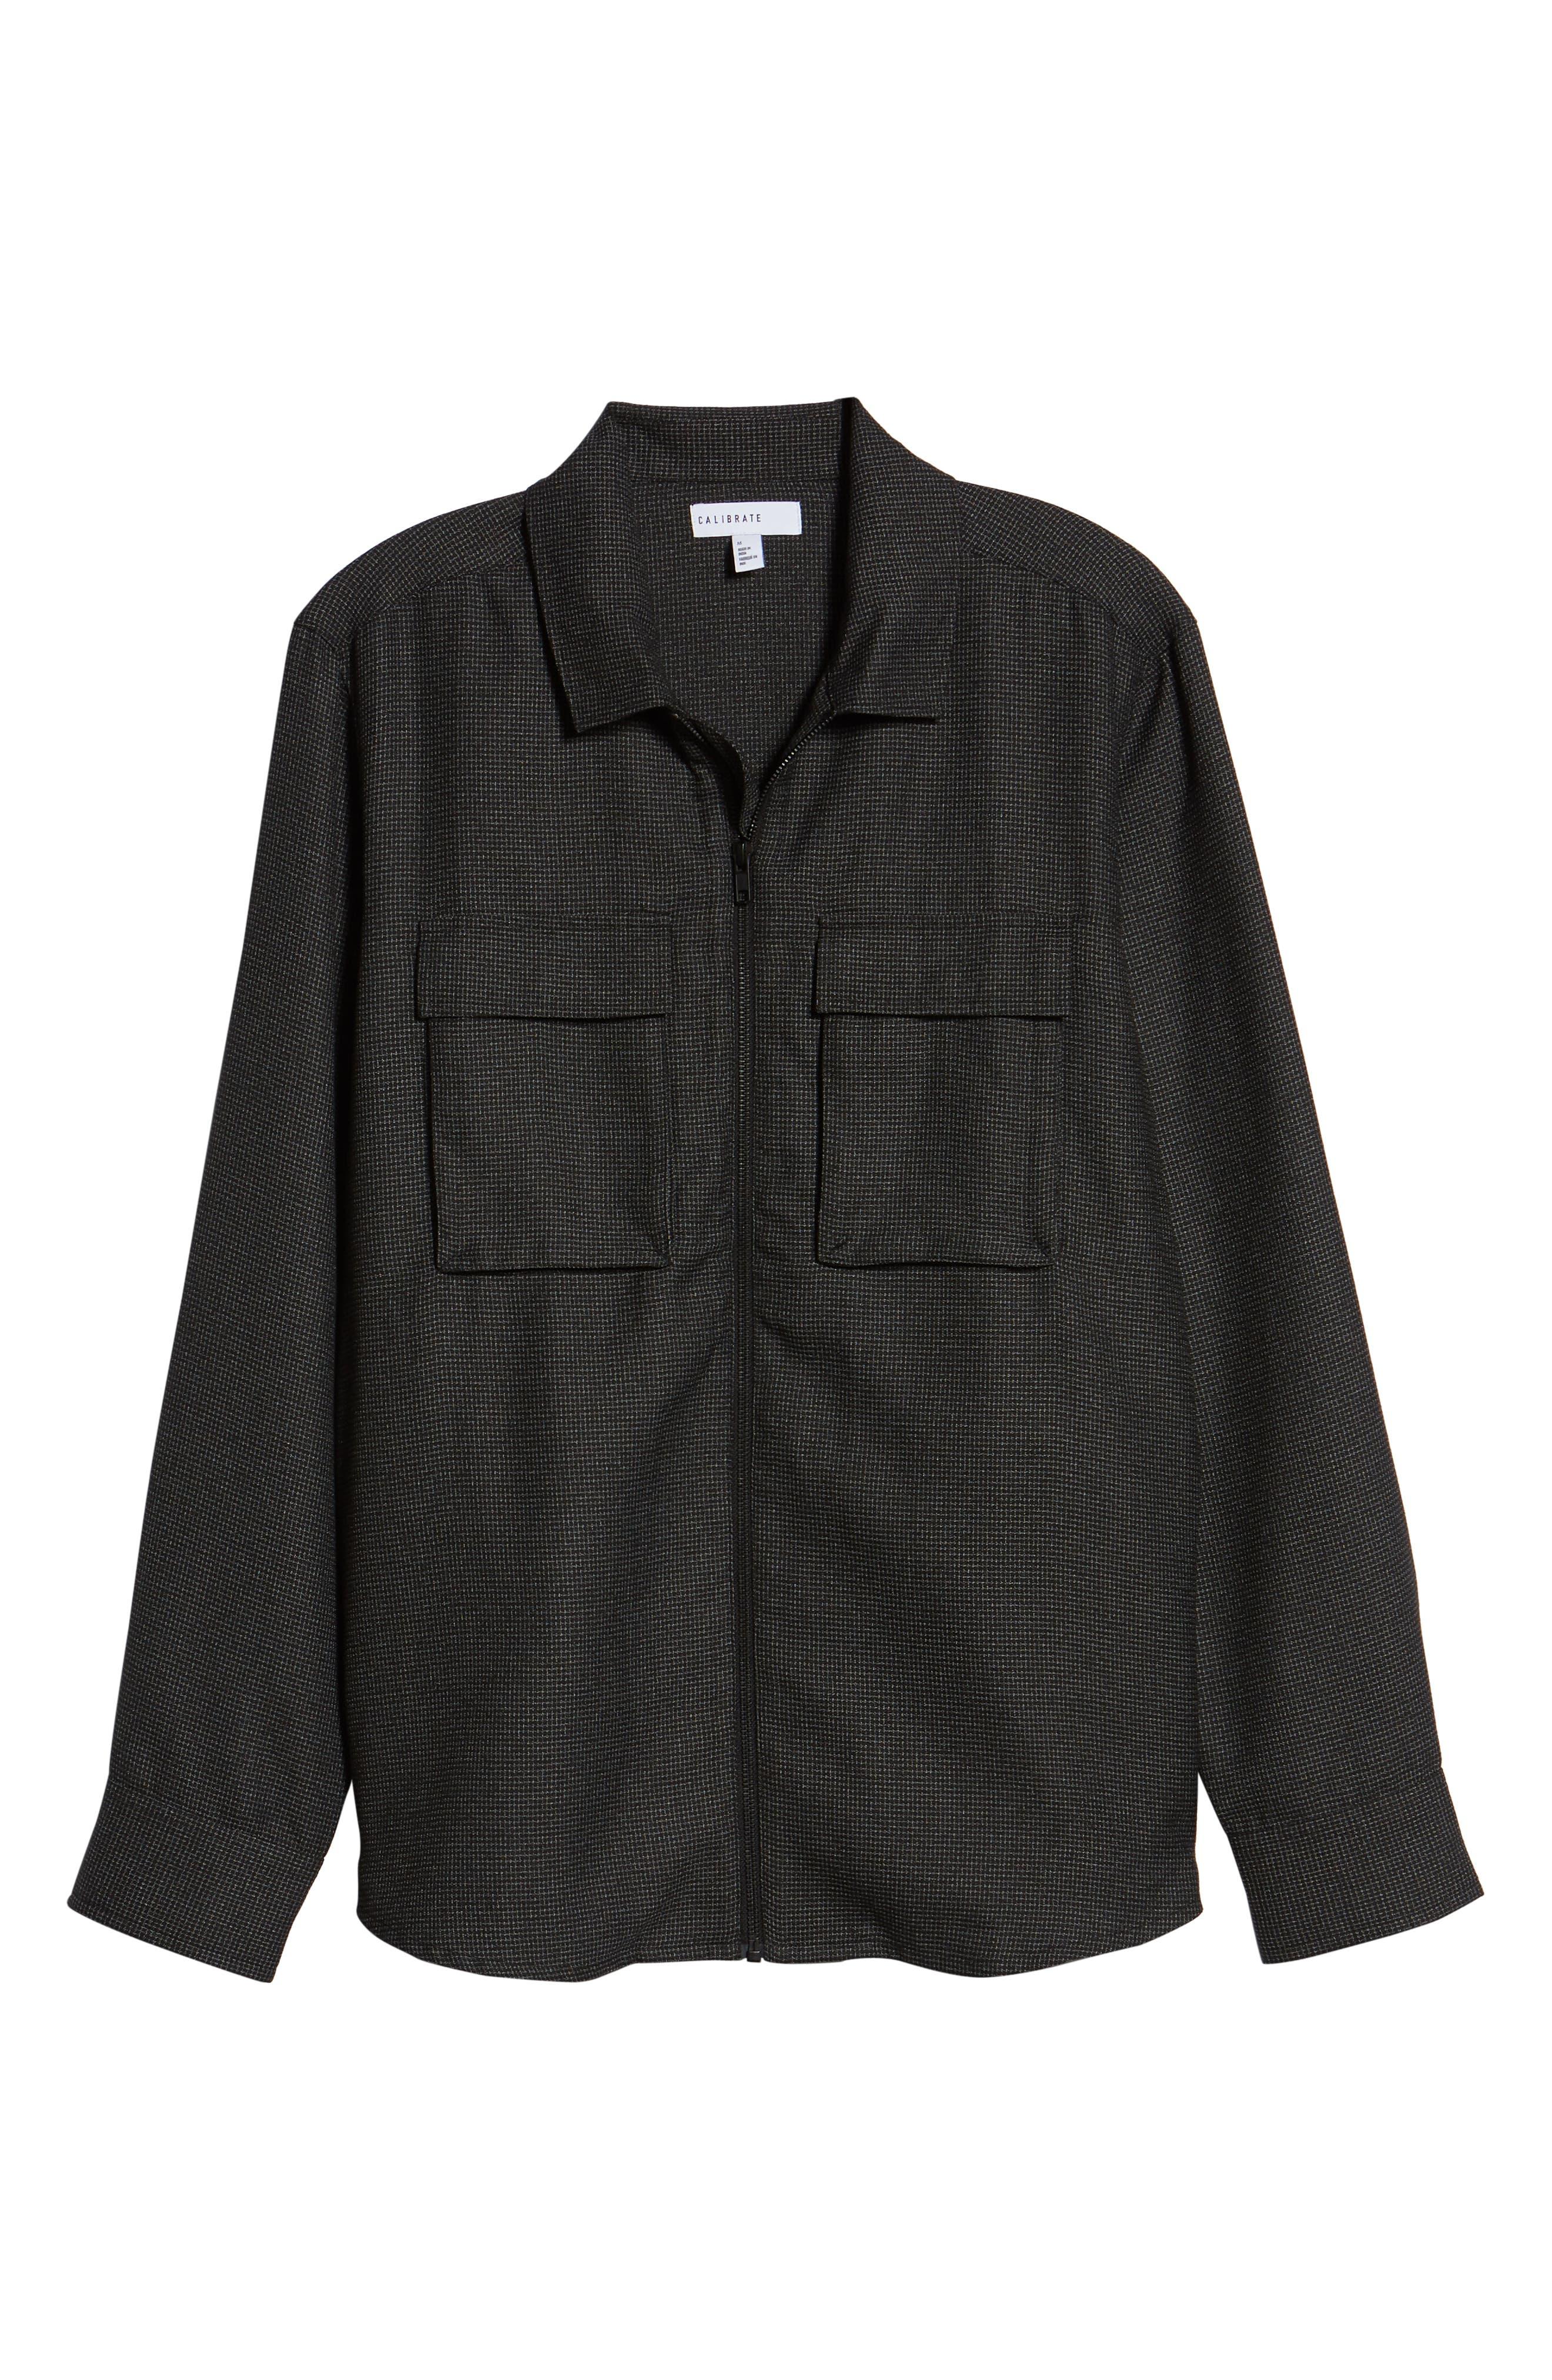 Grid Zip Shirt Jacket,                             Alternate thumbnail 6, color,                             BLACK WHITE GRID